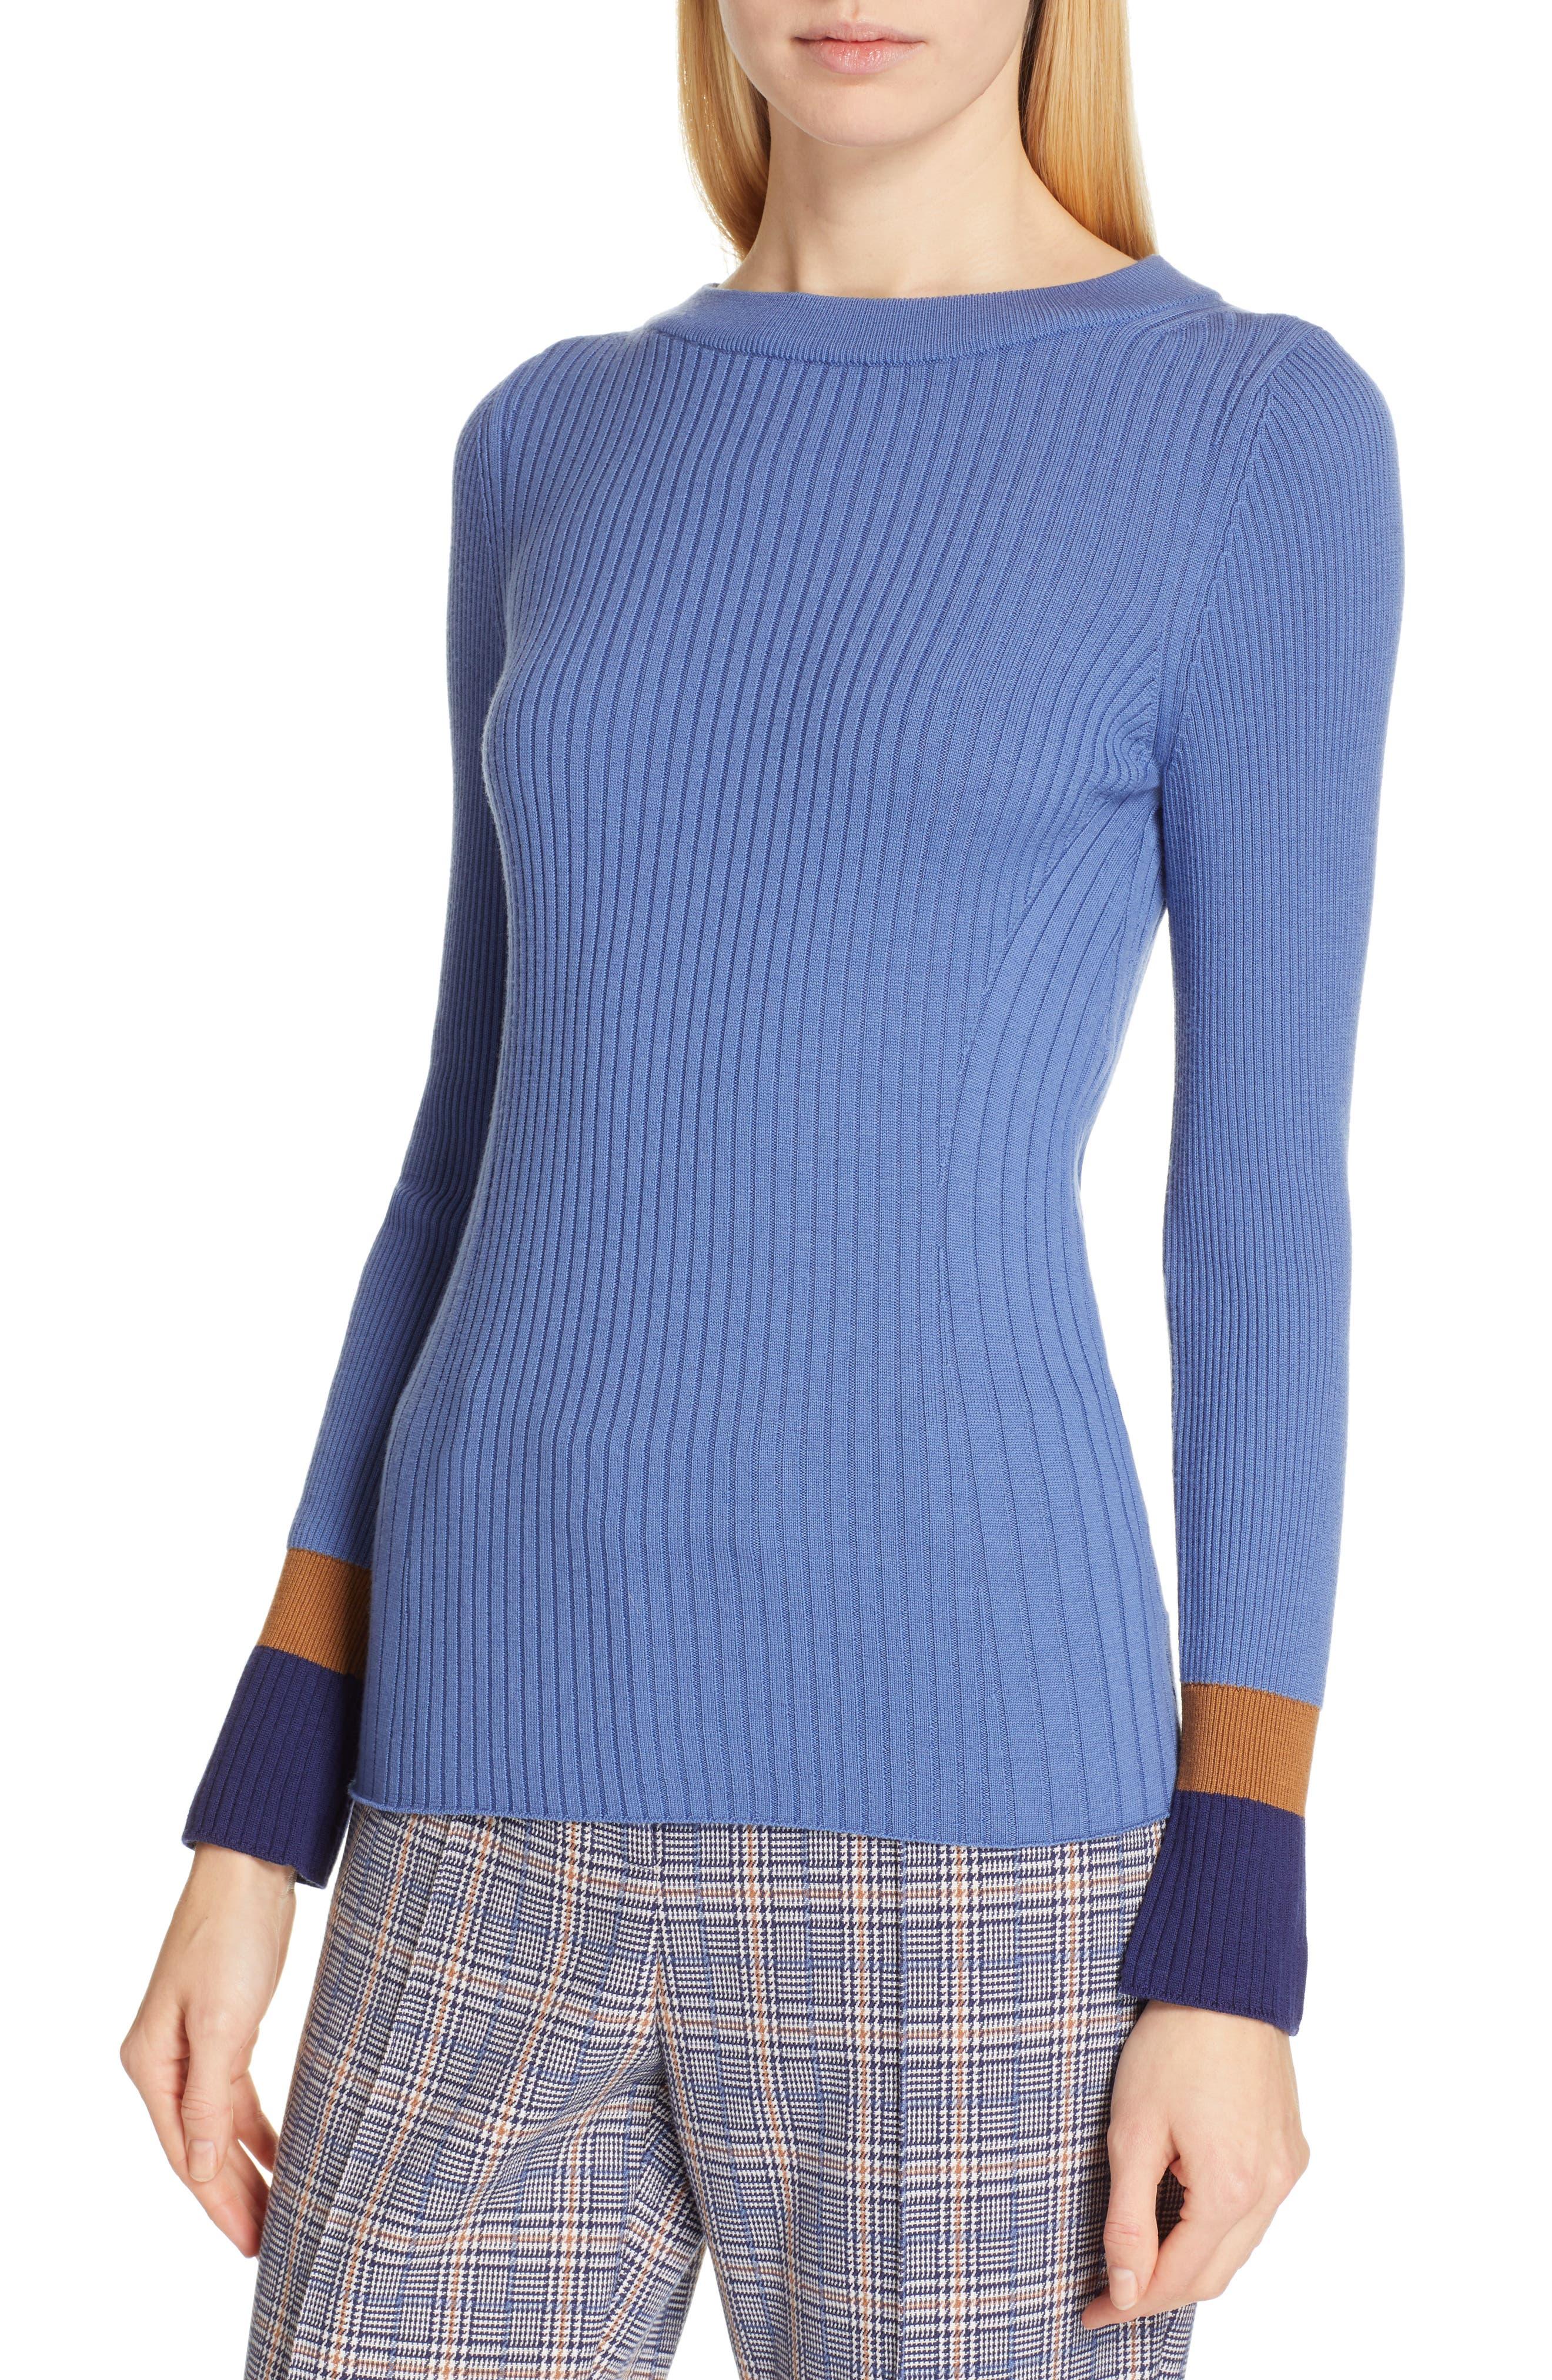 Fadeline Blue Fantasy Ribbed Wool Sweater,                             Alternate thumbnail 4, color,                             SOFT BLUE FANTASY